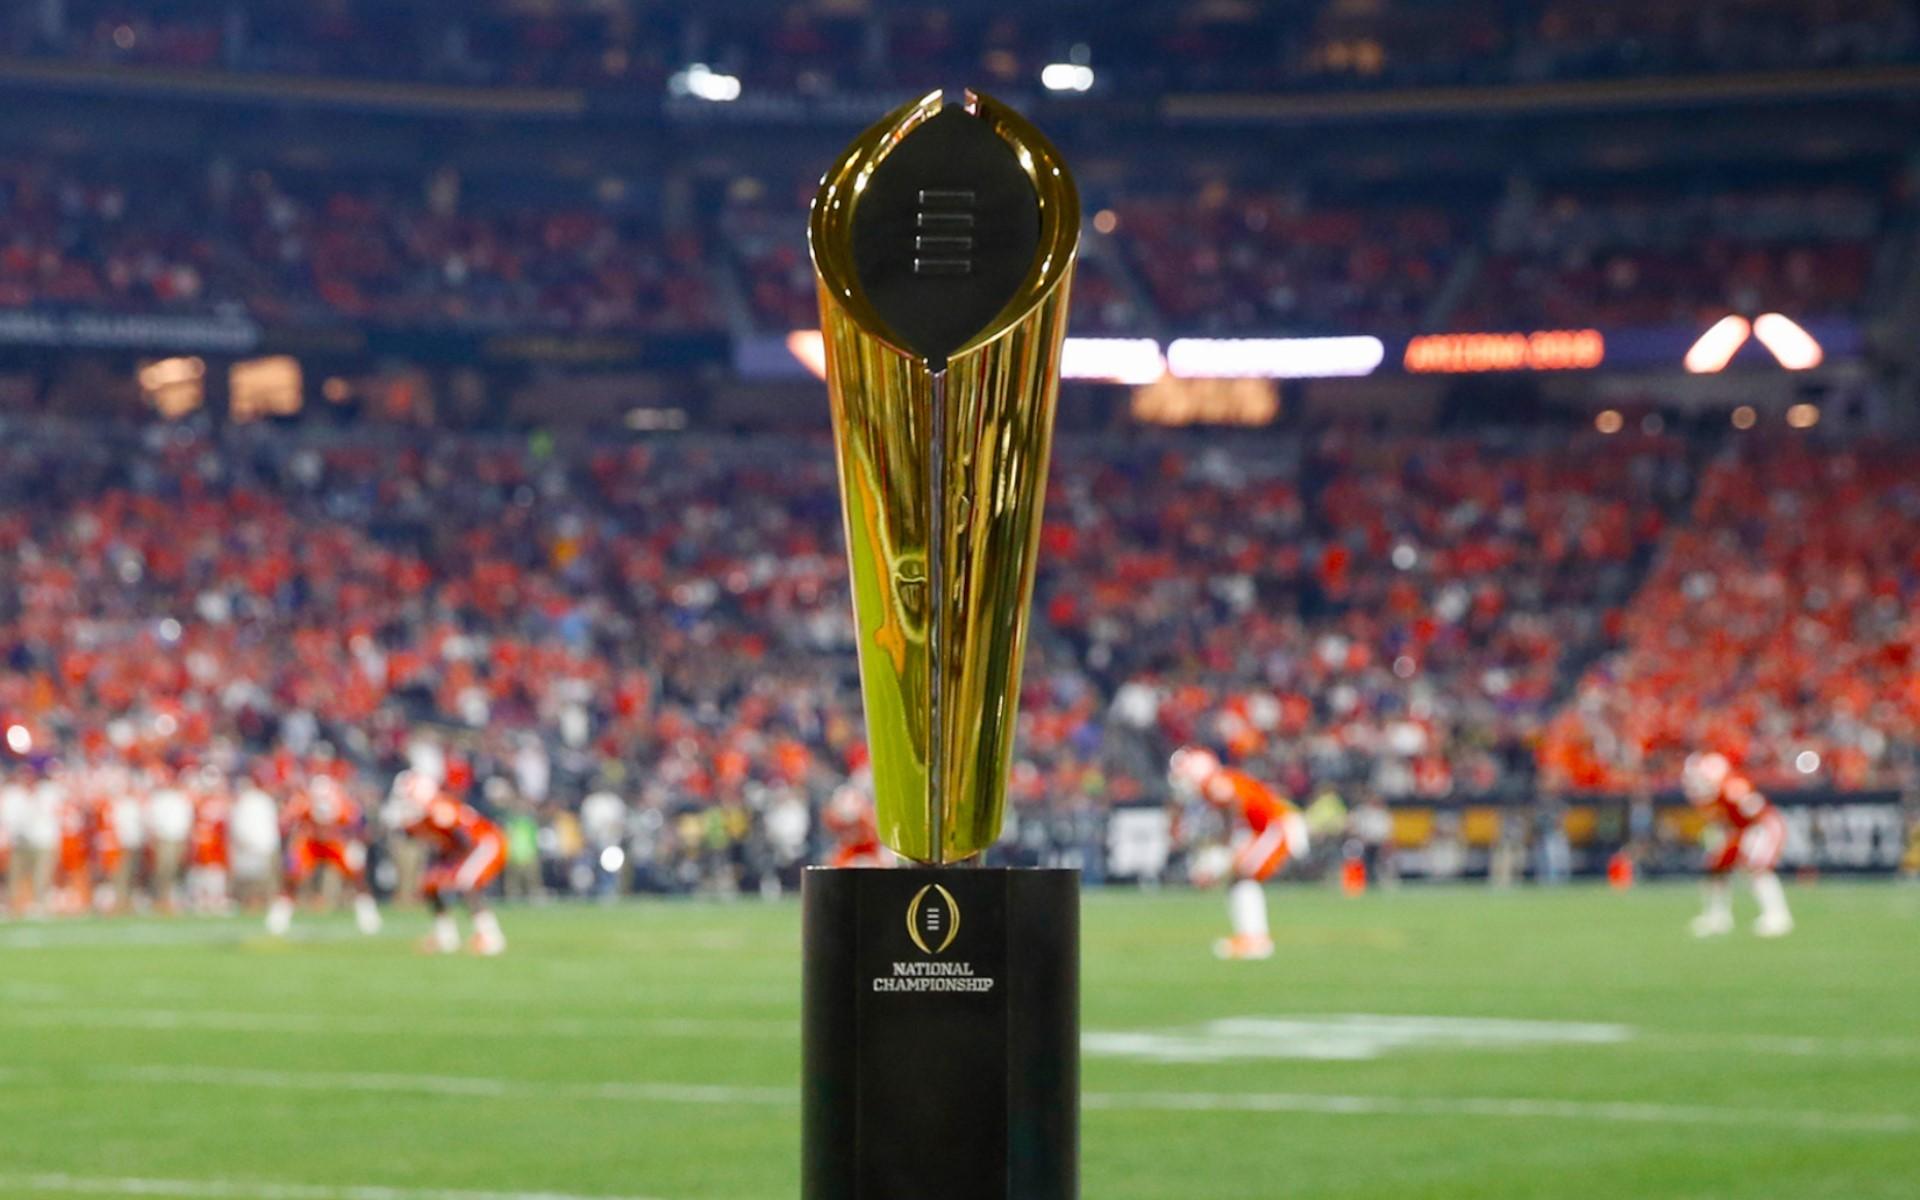 Week 12 College Football Overreactions Playoff Rankings